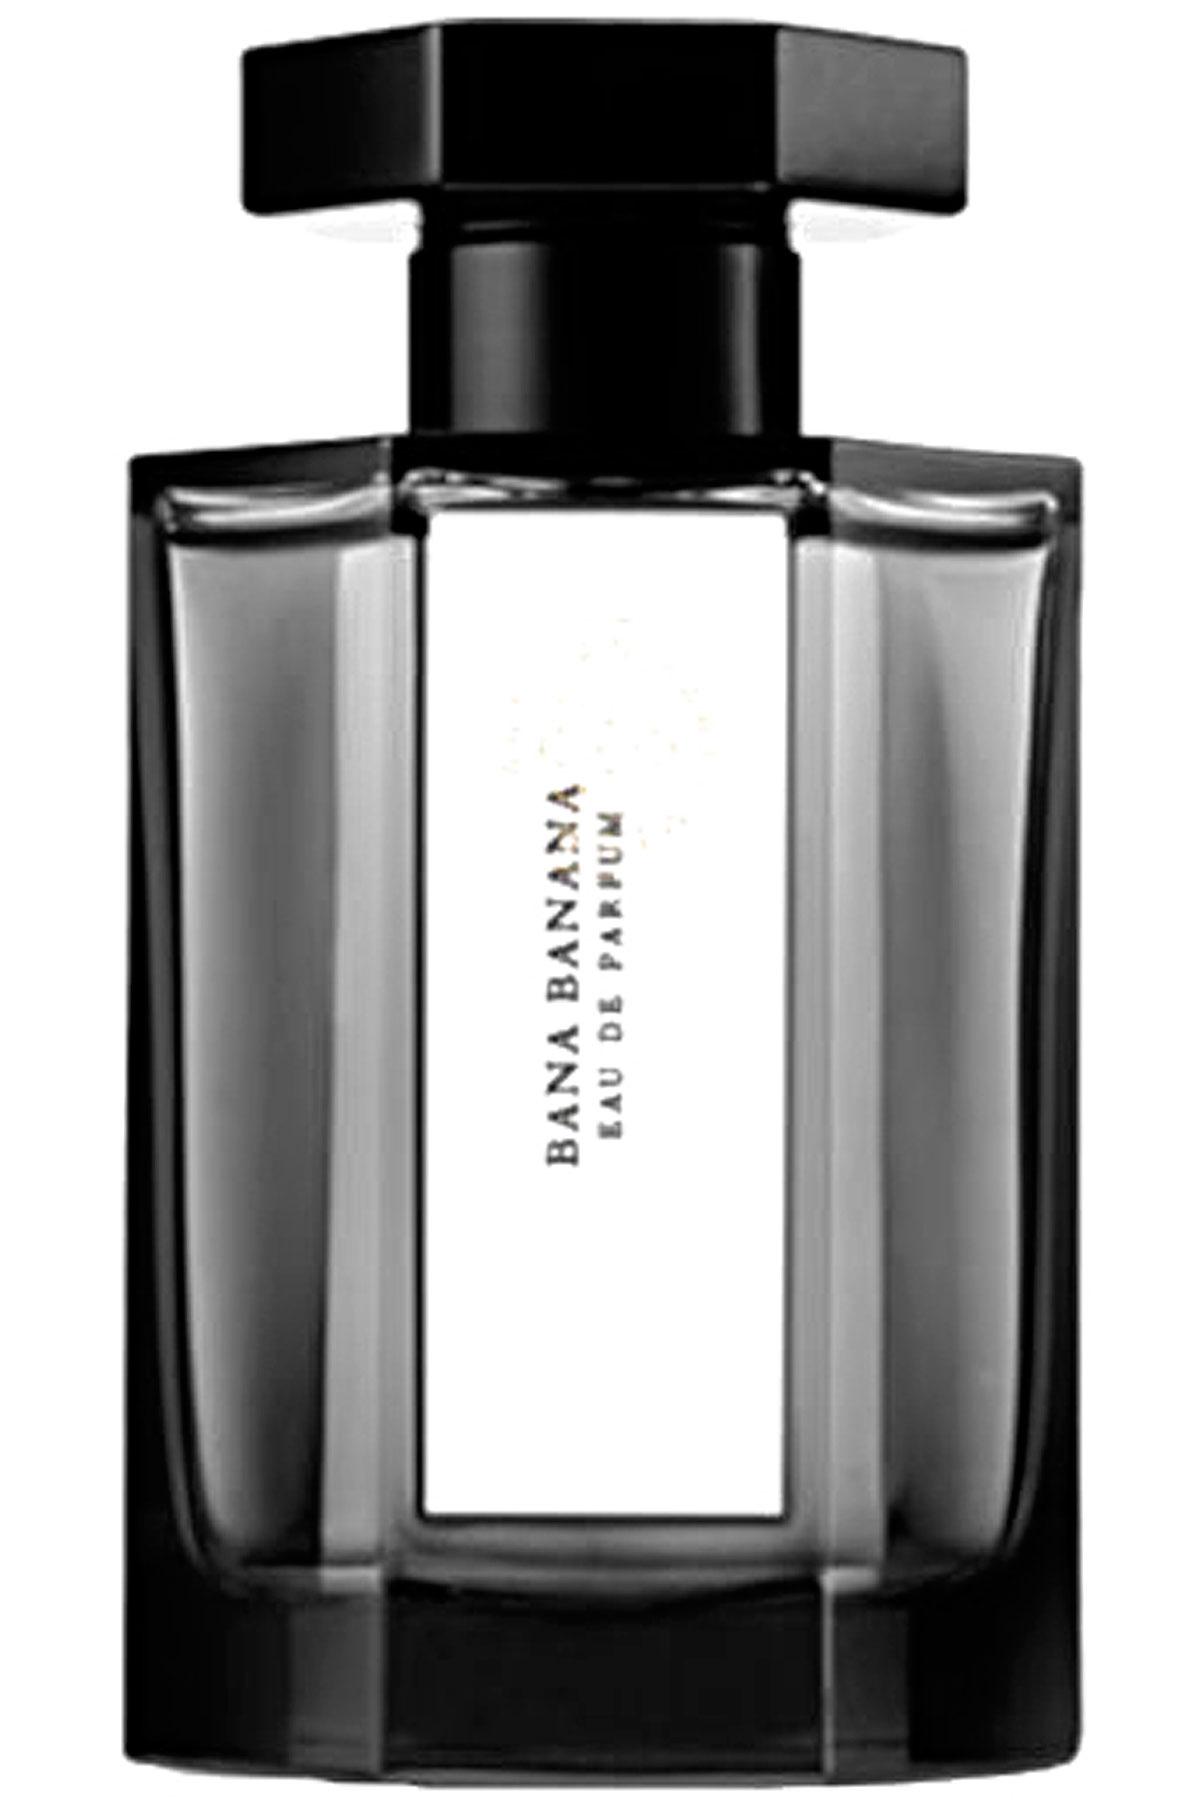 Artisan Parfumeur Fragrances for Men, Bana Banana - Eau De Parfum - 100 Ml, 2019, 100 ml